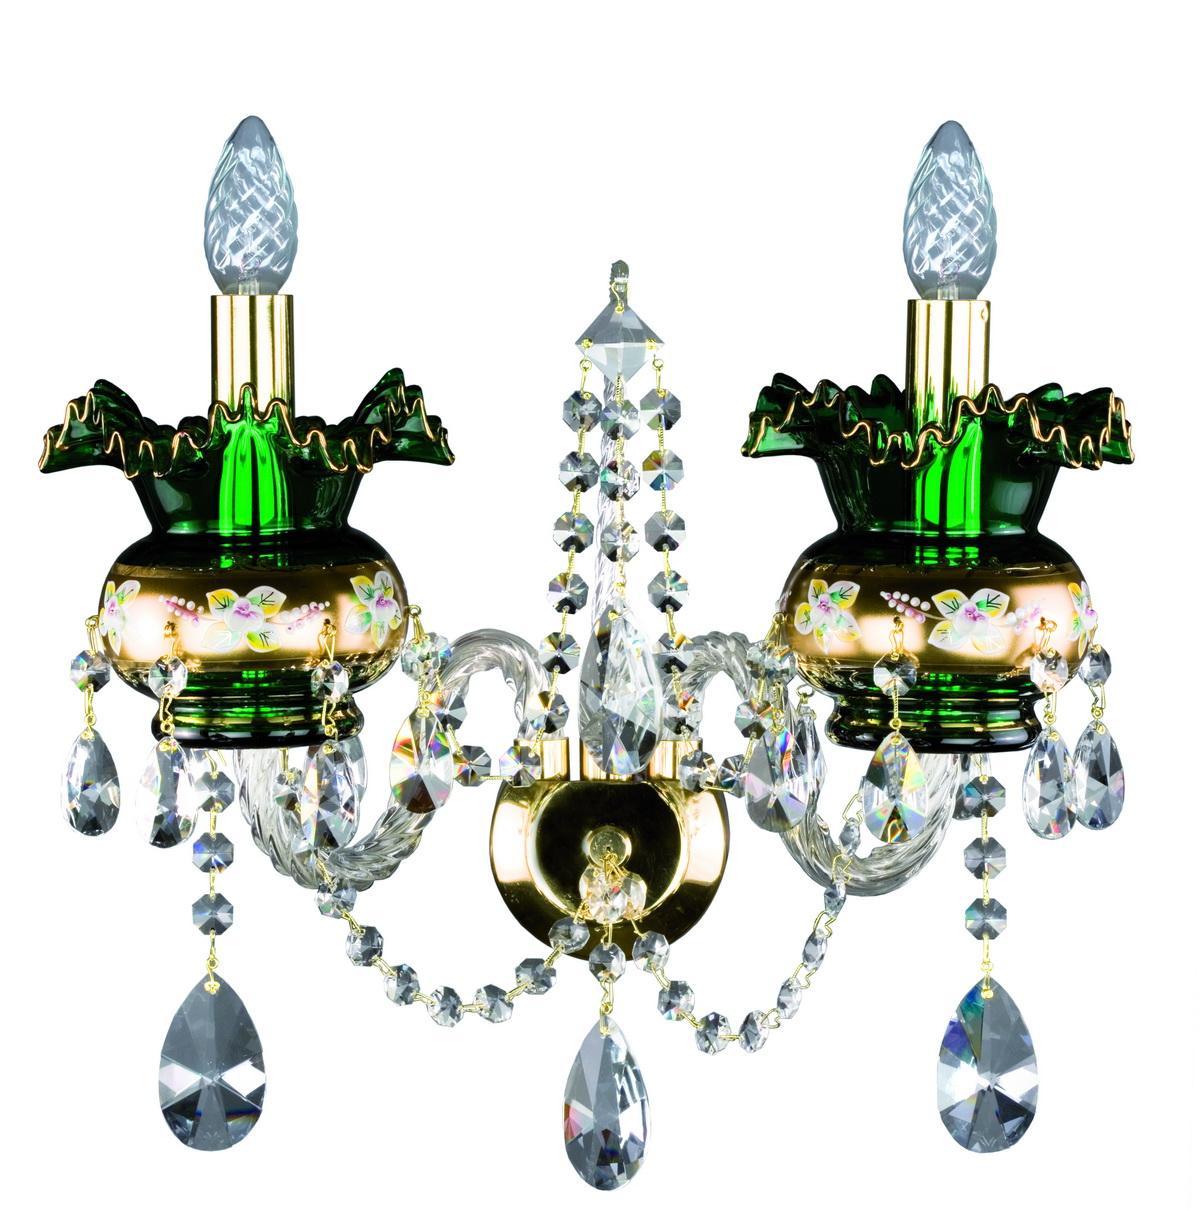 2x40w Sconce Crystal Treasury Com